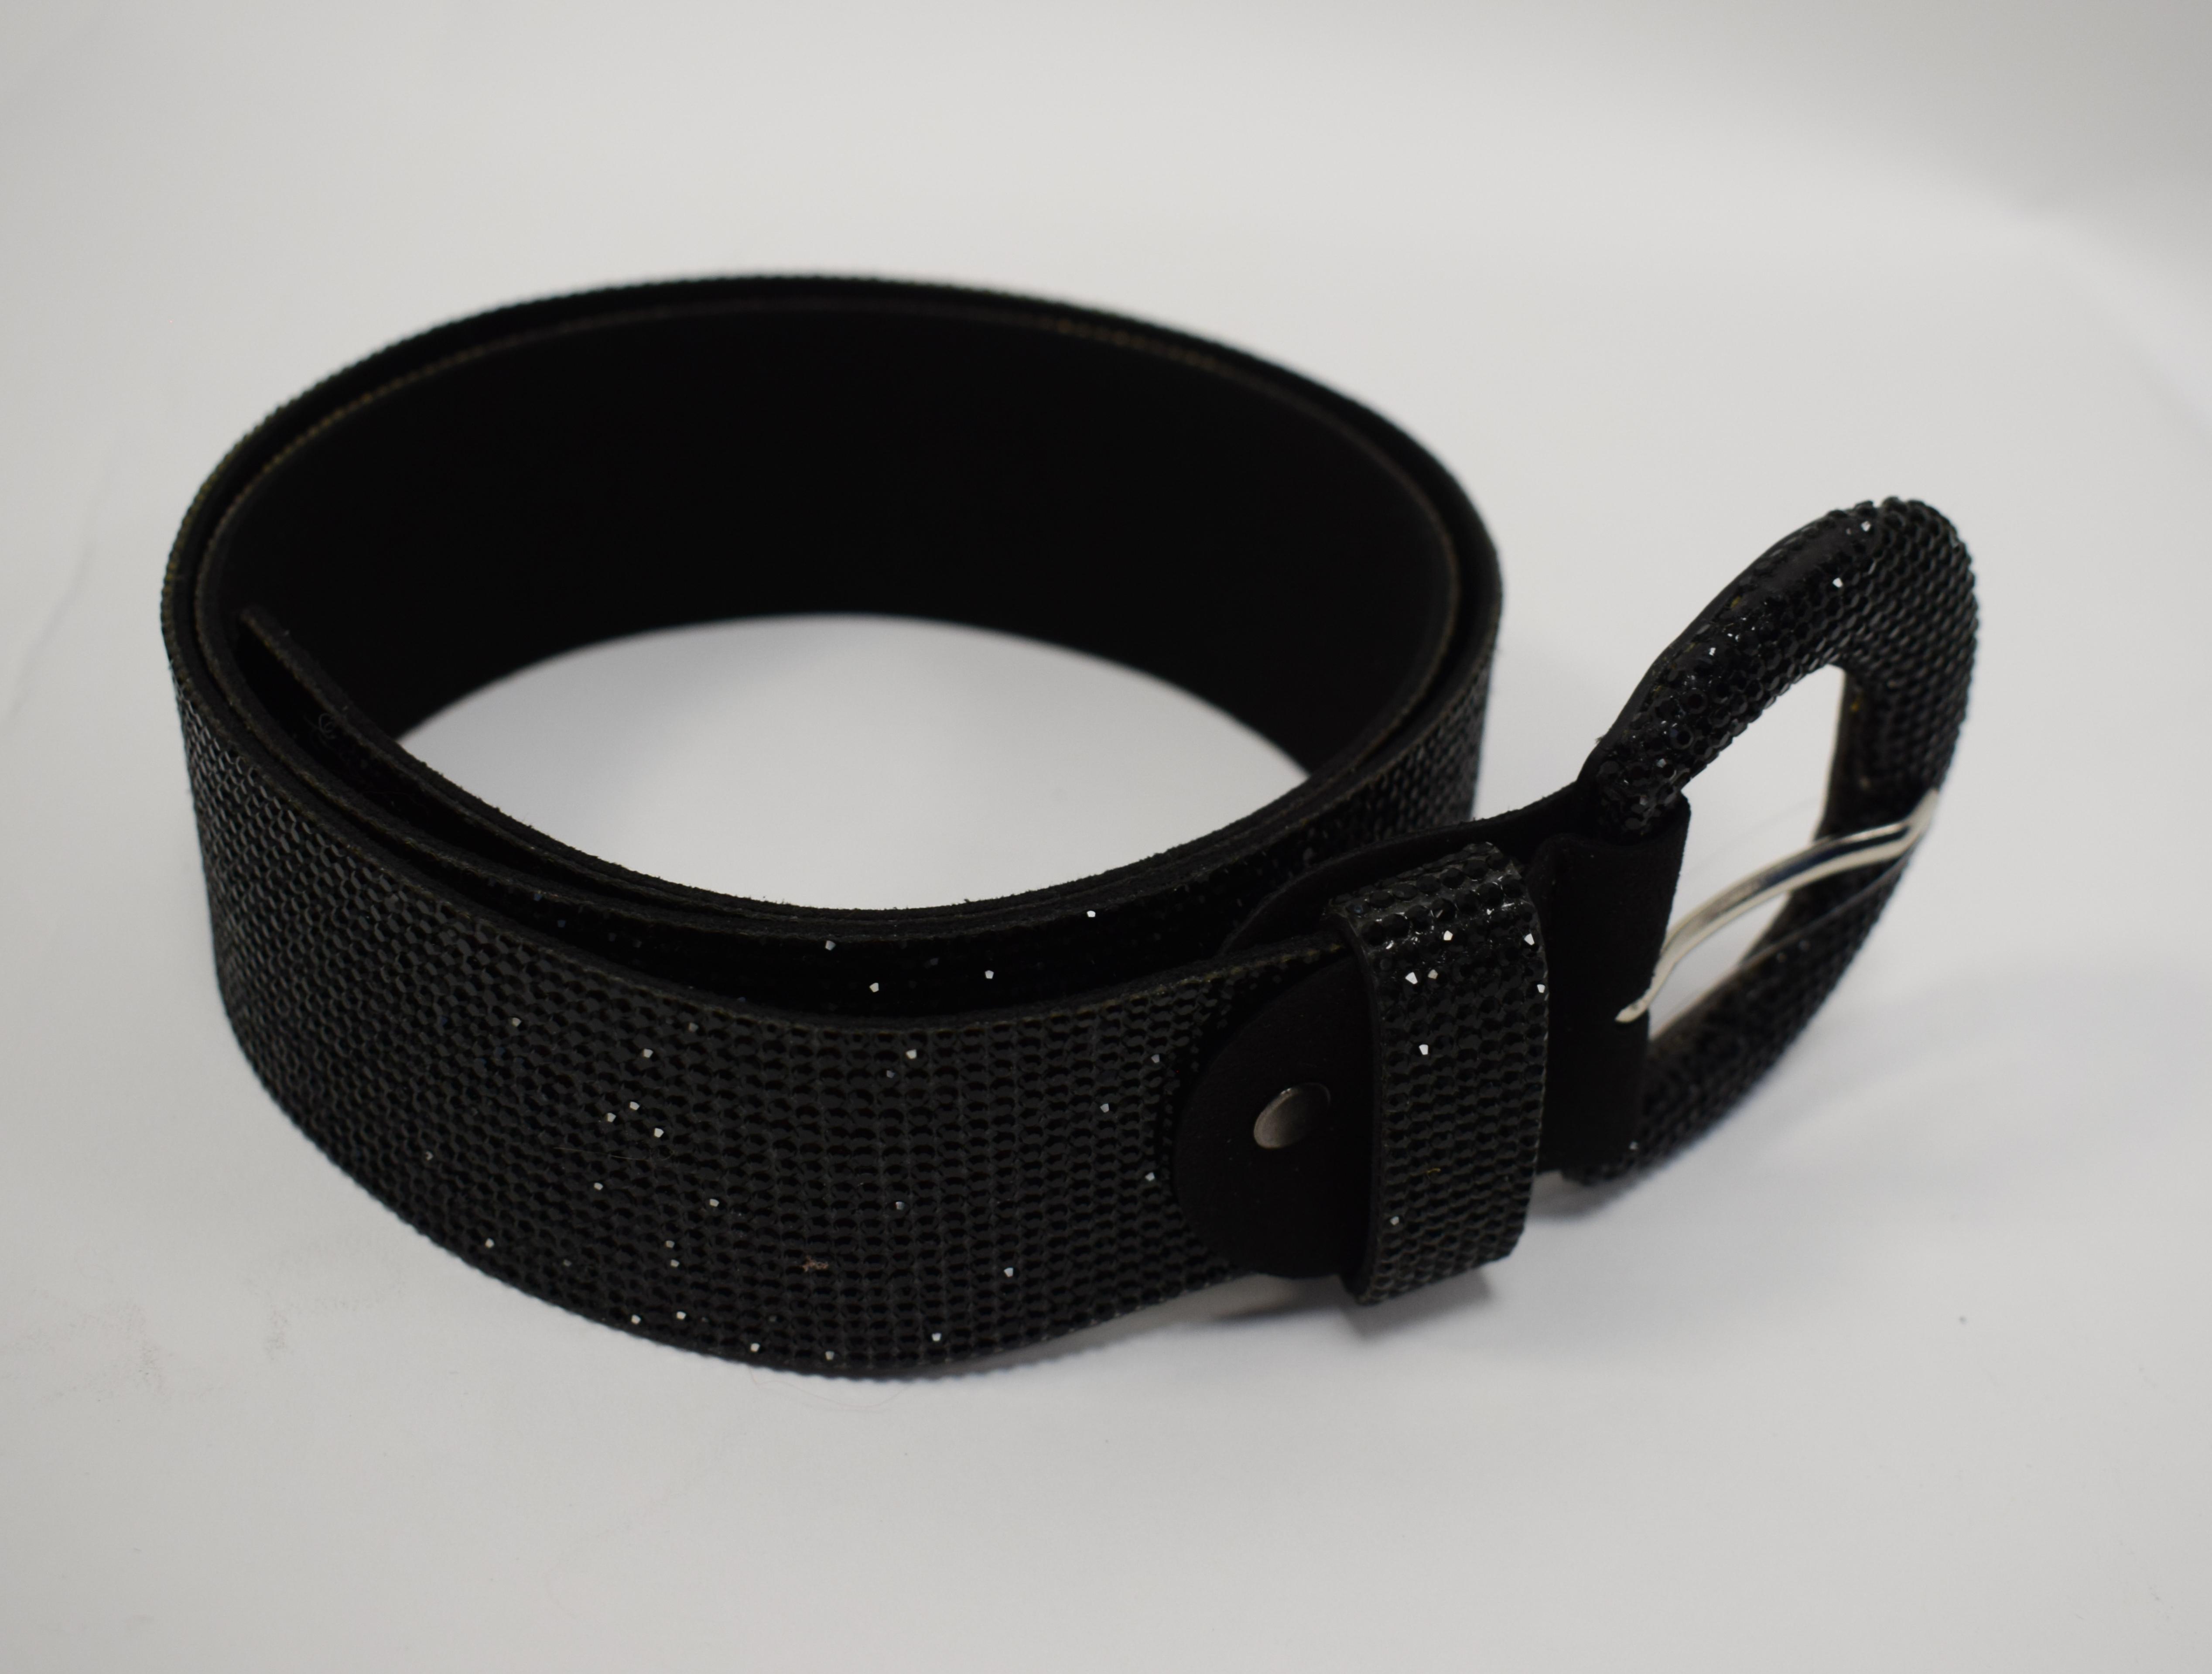 Schwarzer Gürtel mit schwarzem Strass